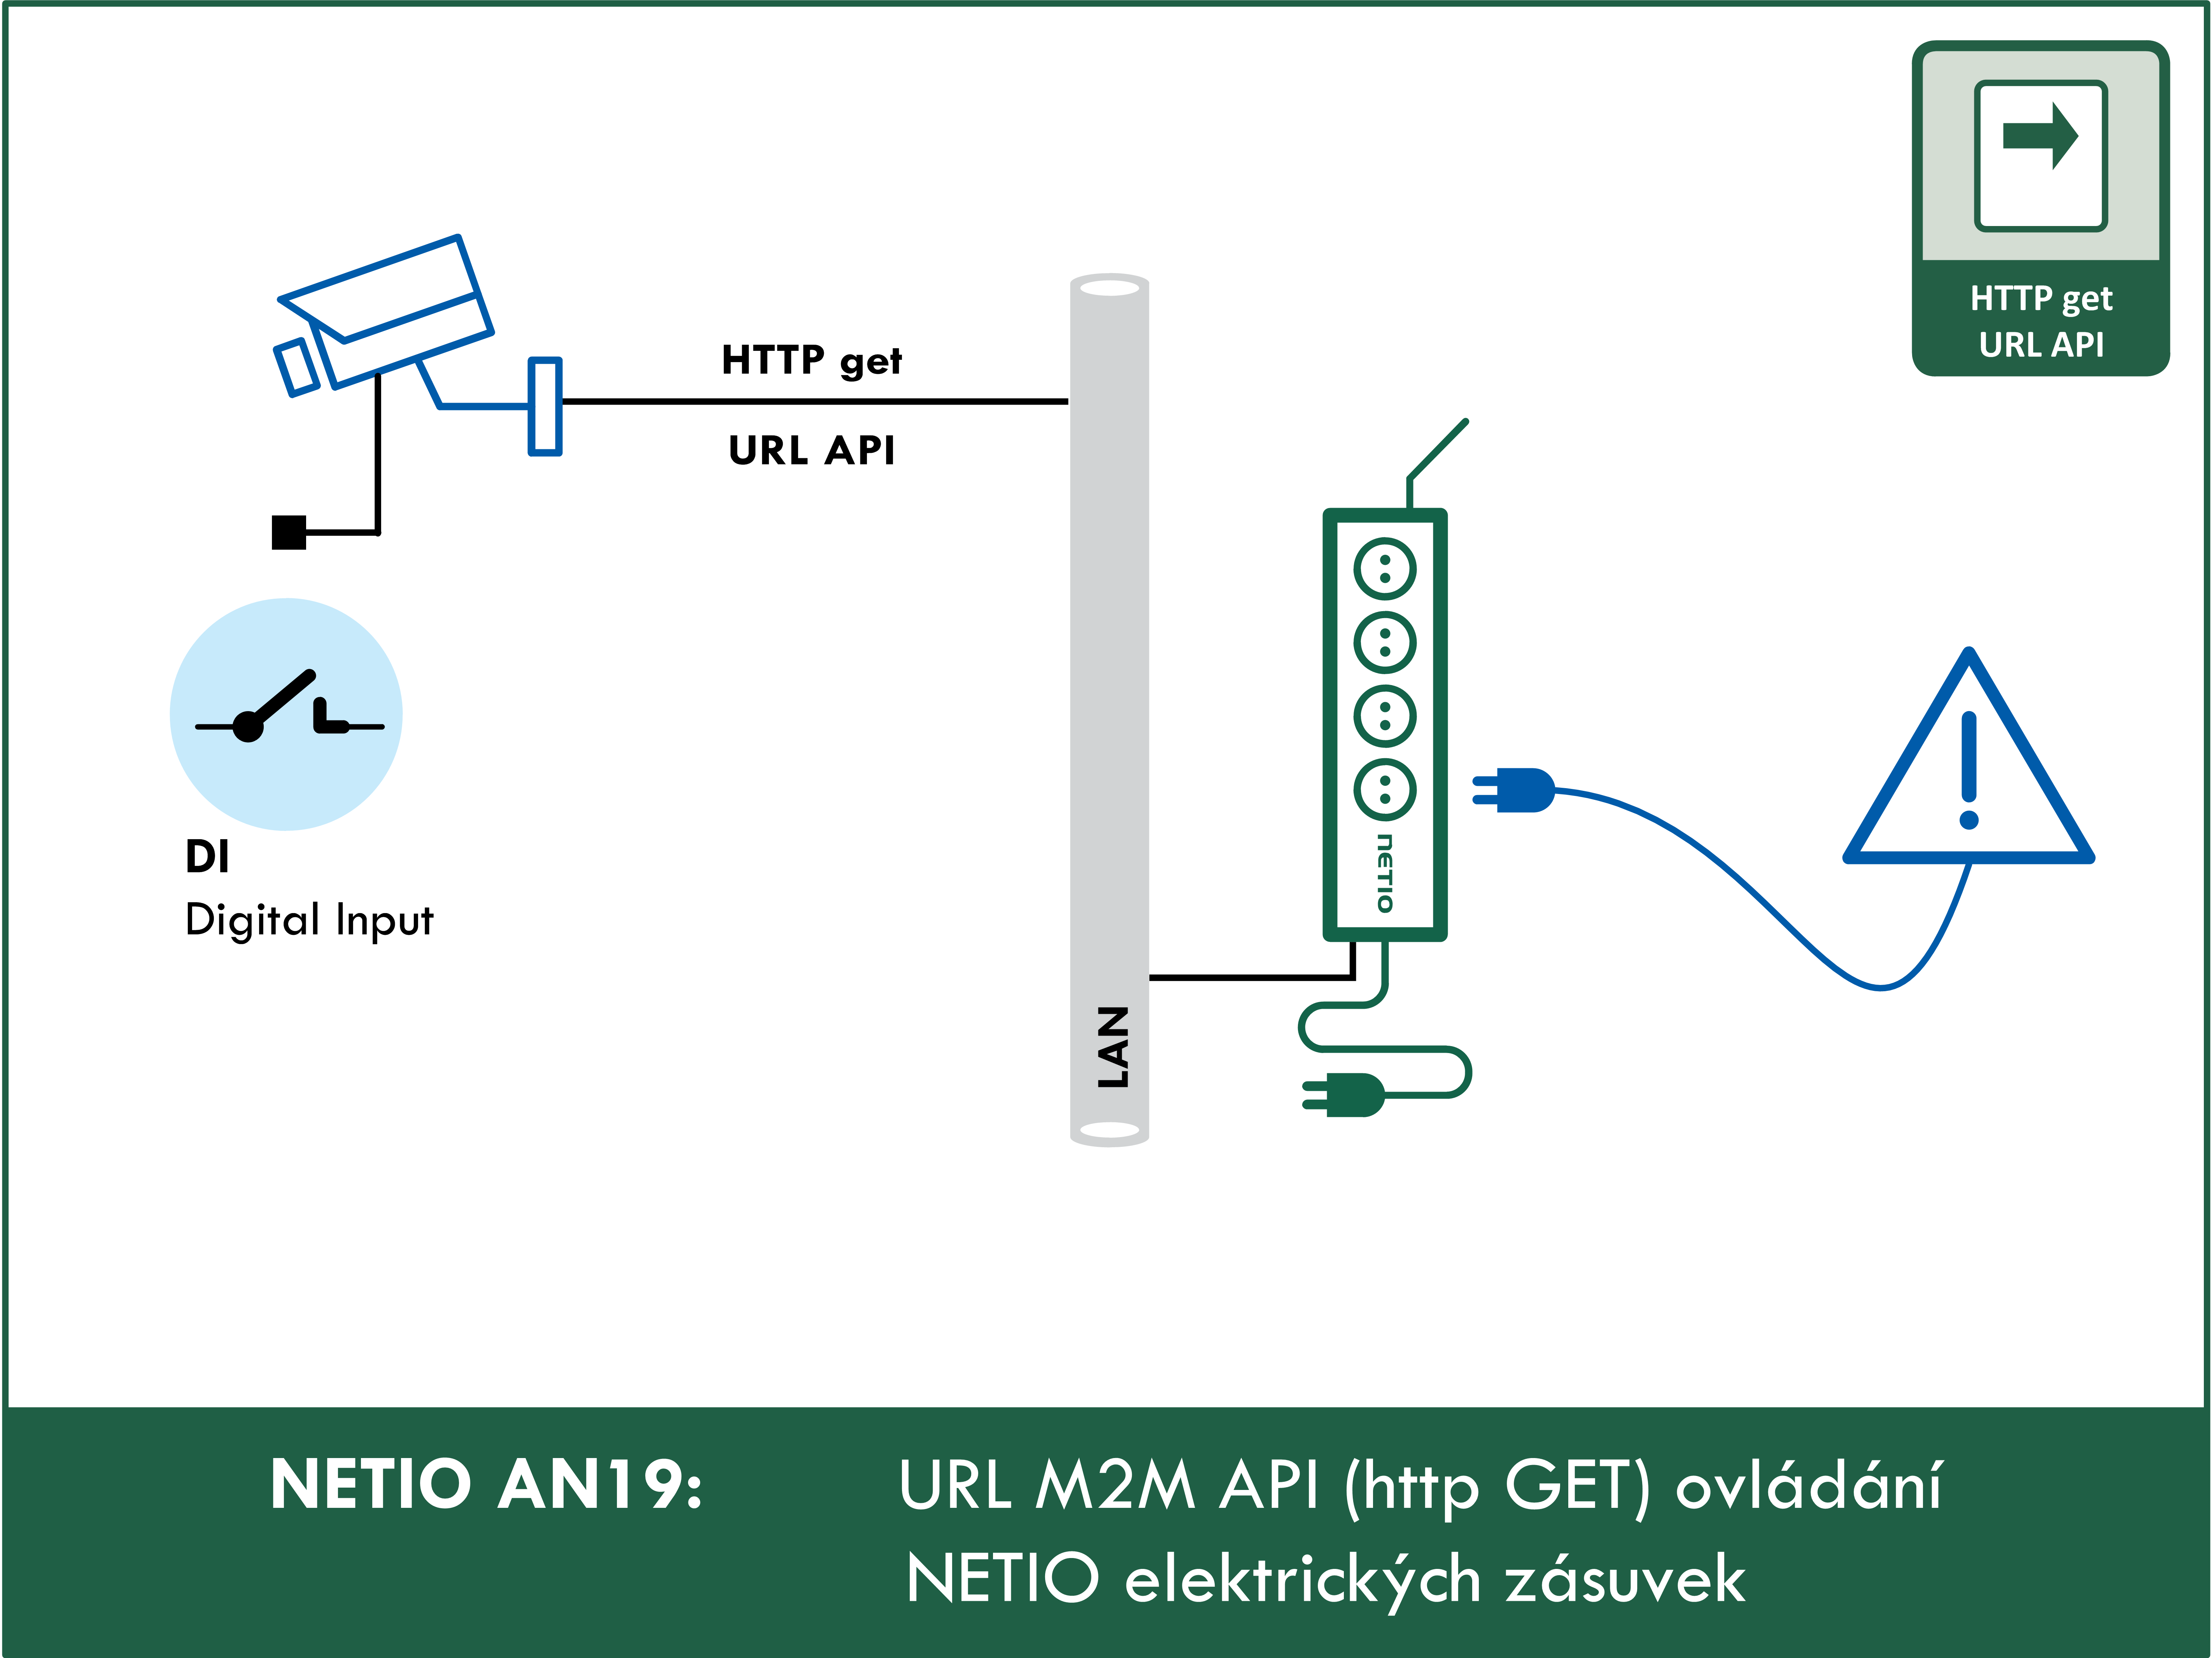 URL M2M API (http GET) ovládání NETIO elektrických zásuvek